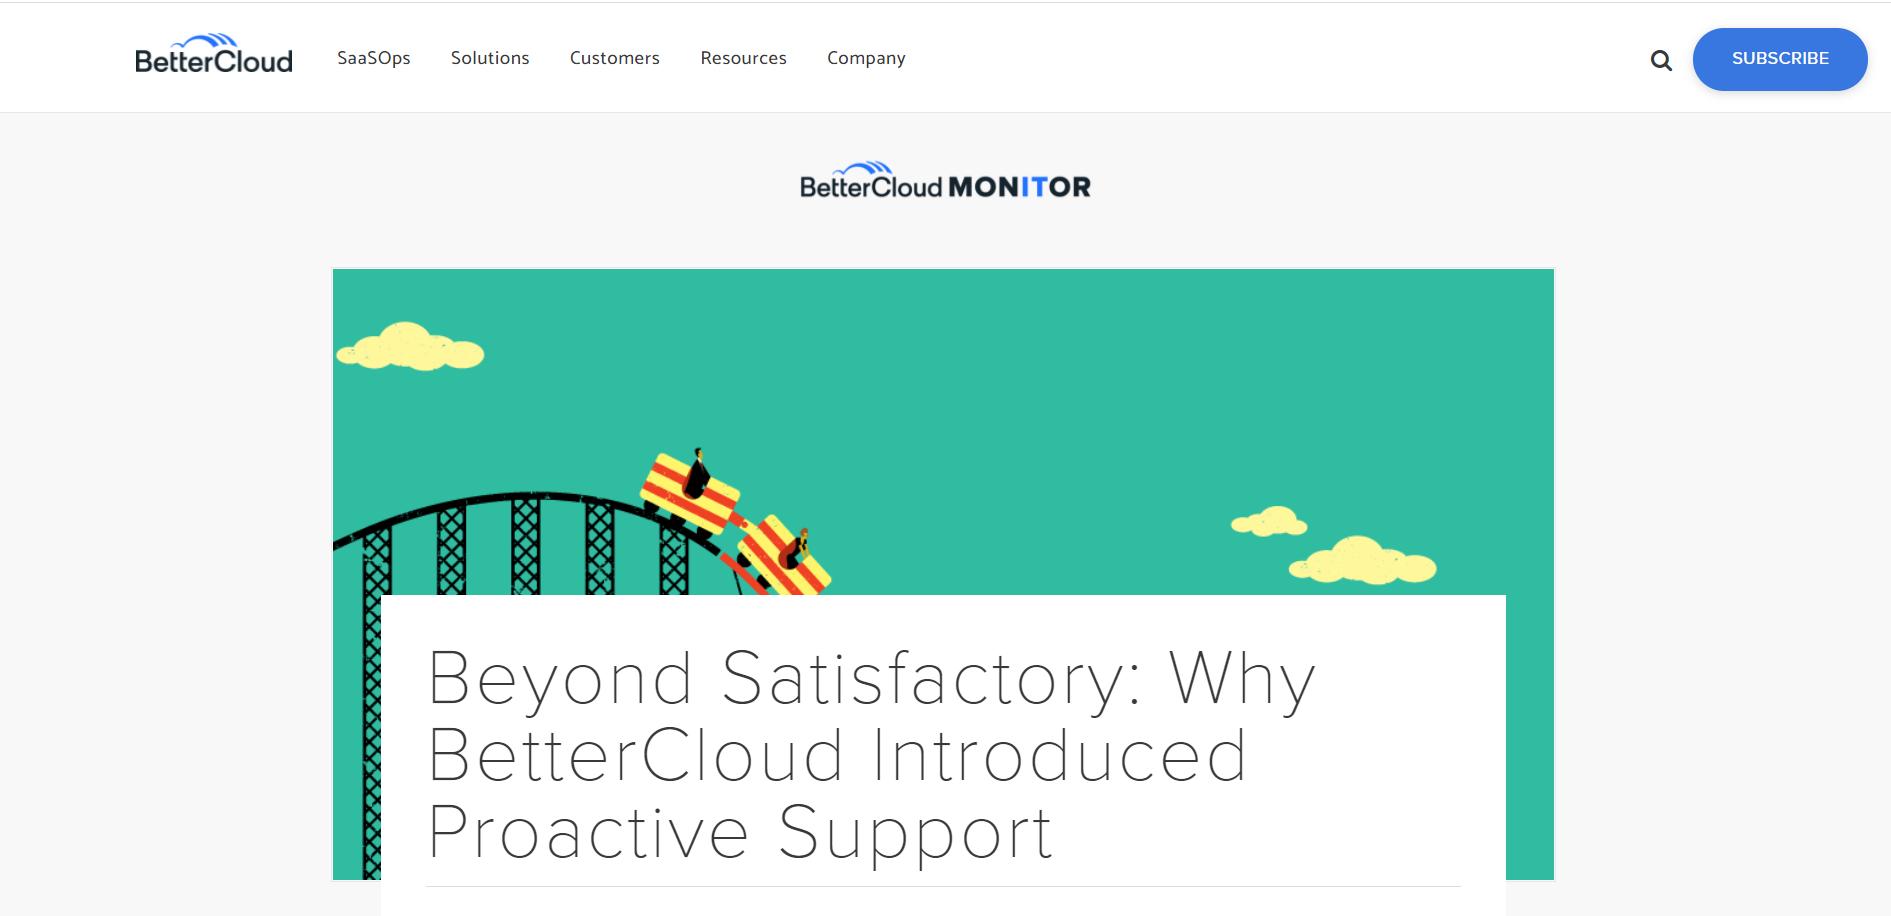 BetterCloudのウェブサイト